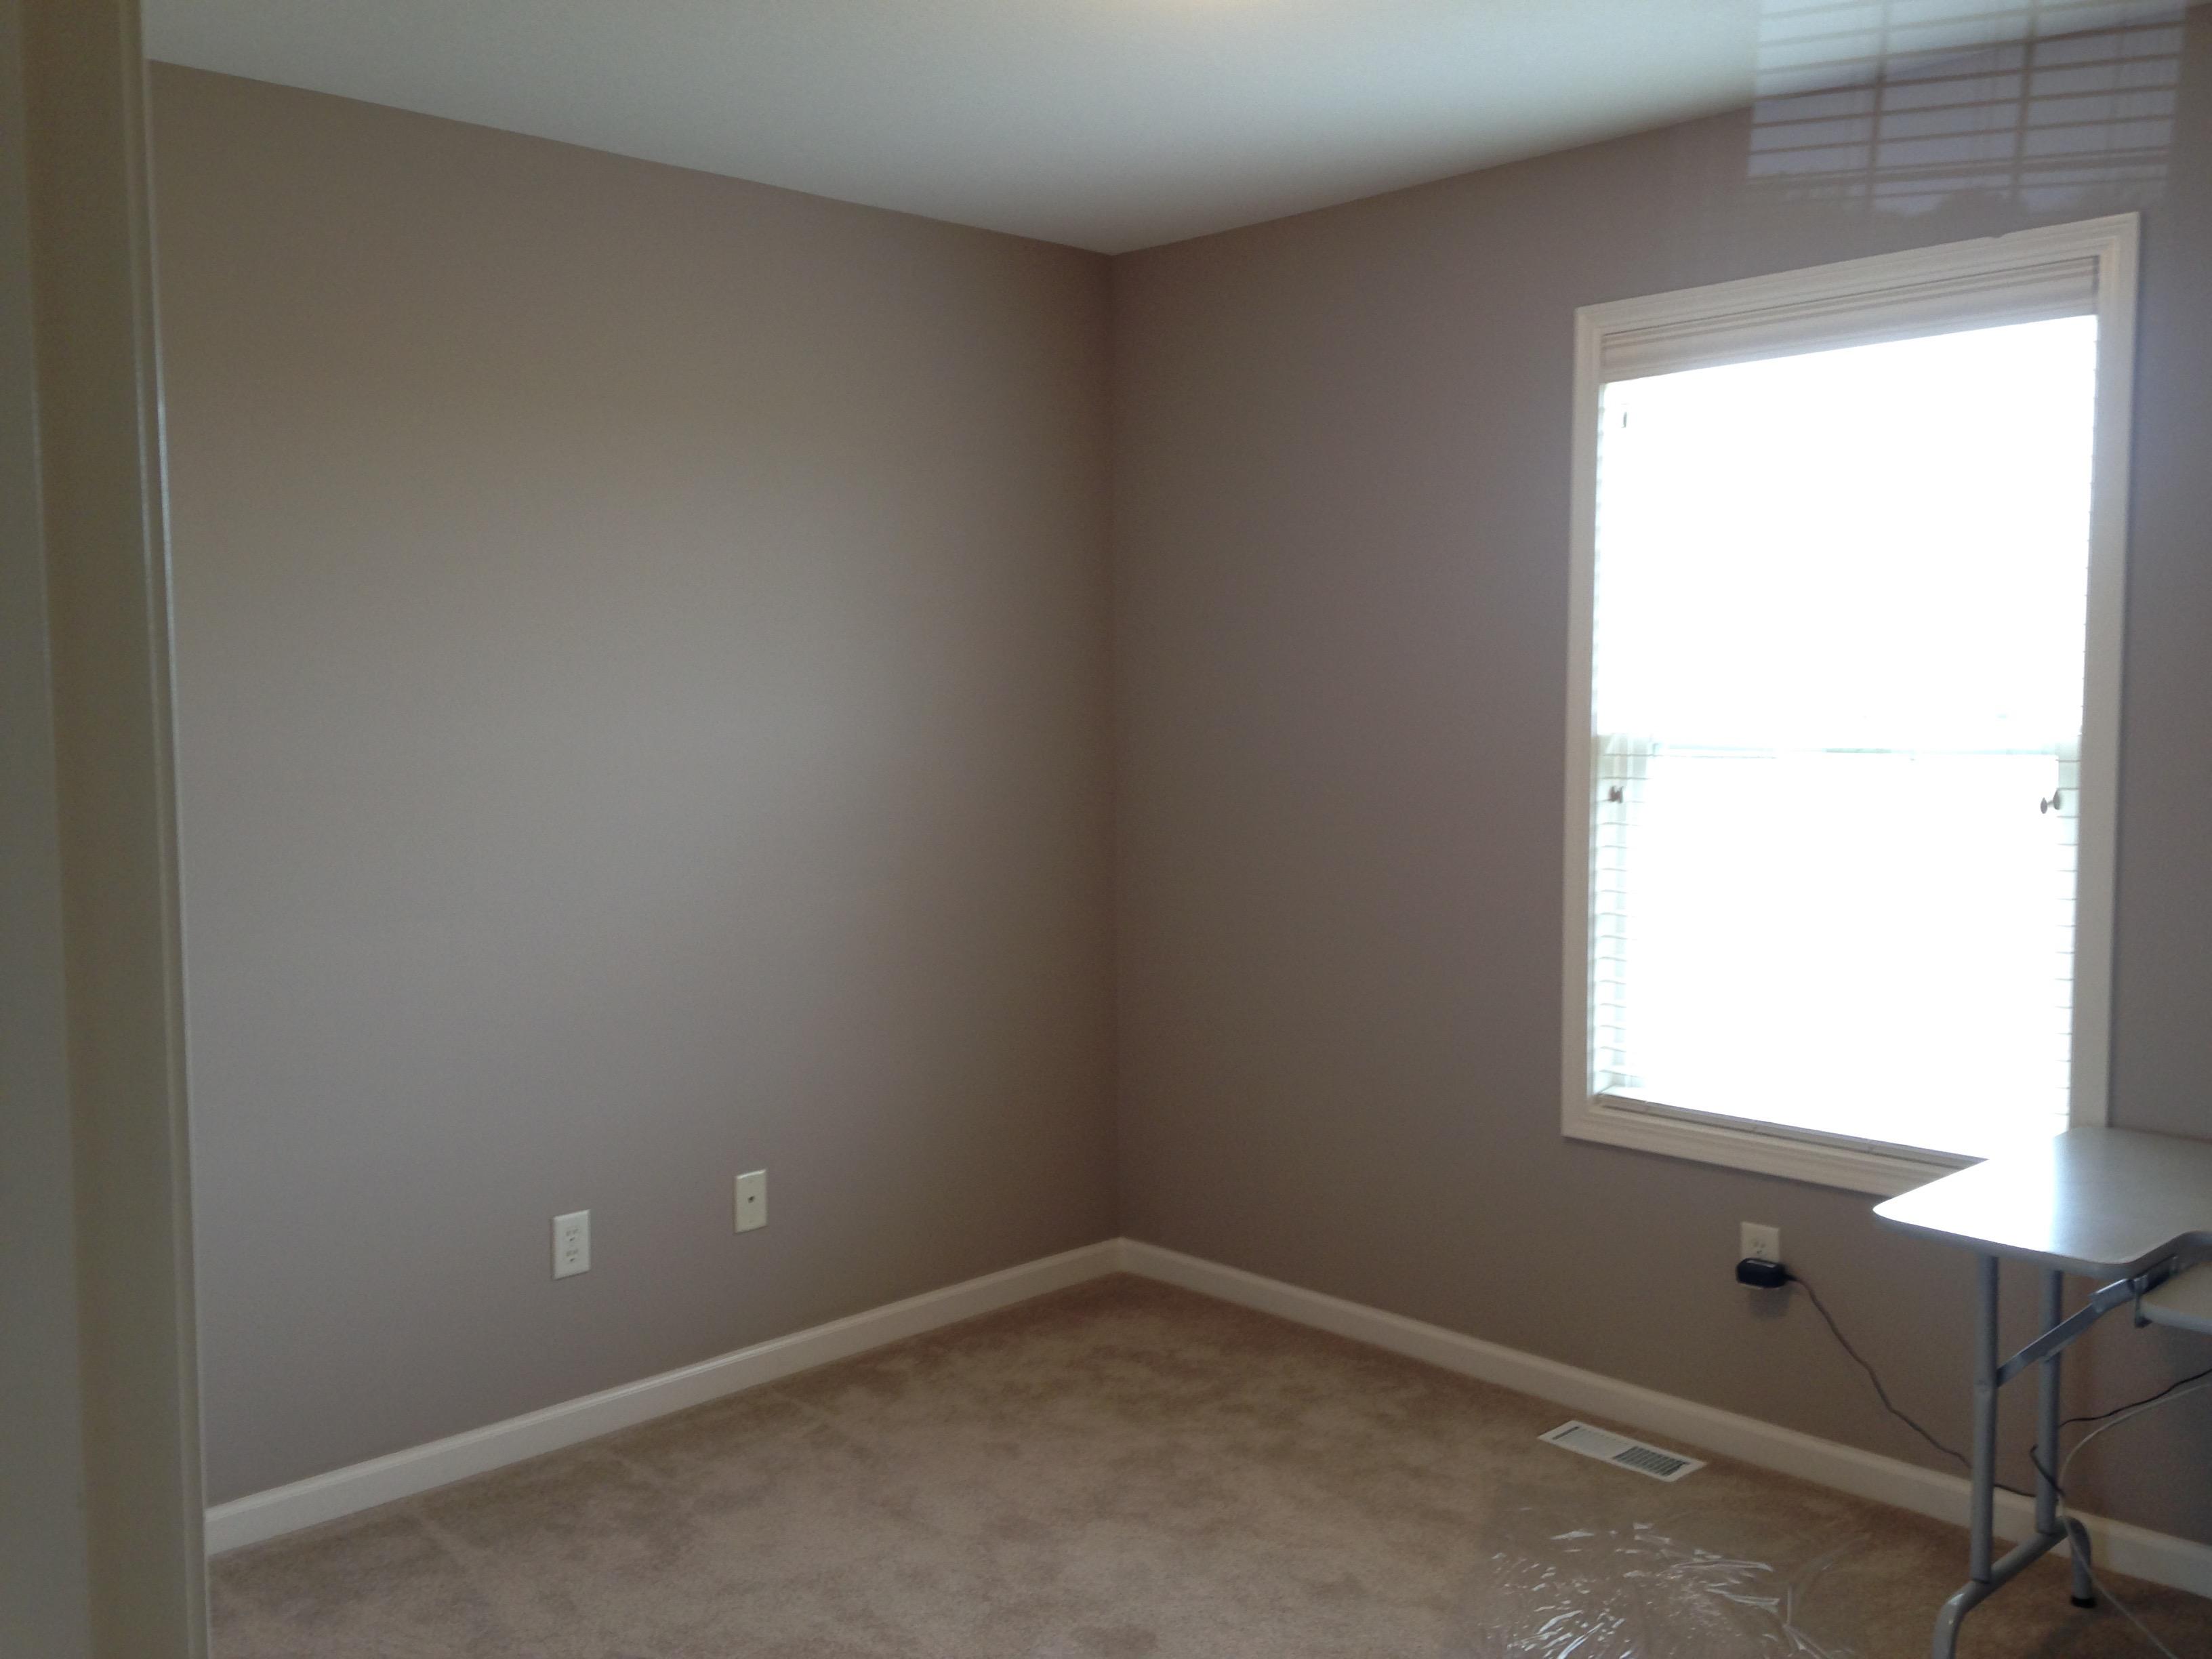 2 Bedroom Apartments In Bloomington Il Bedroom 2 Bedroom Apartments Bloomington In 2 Bedroom